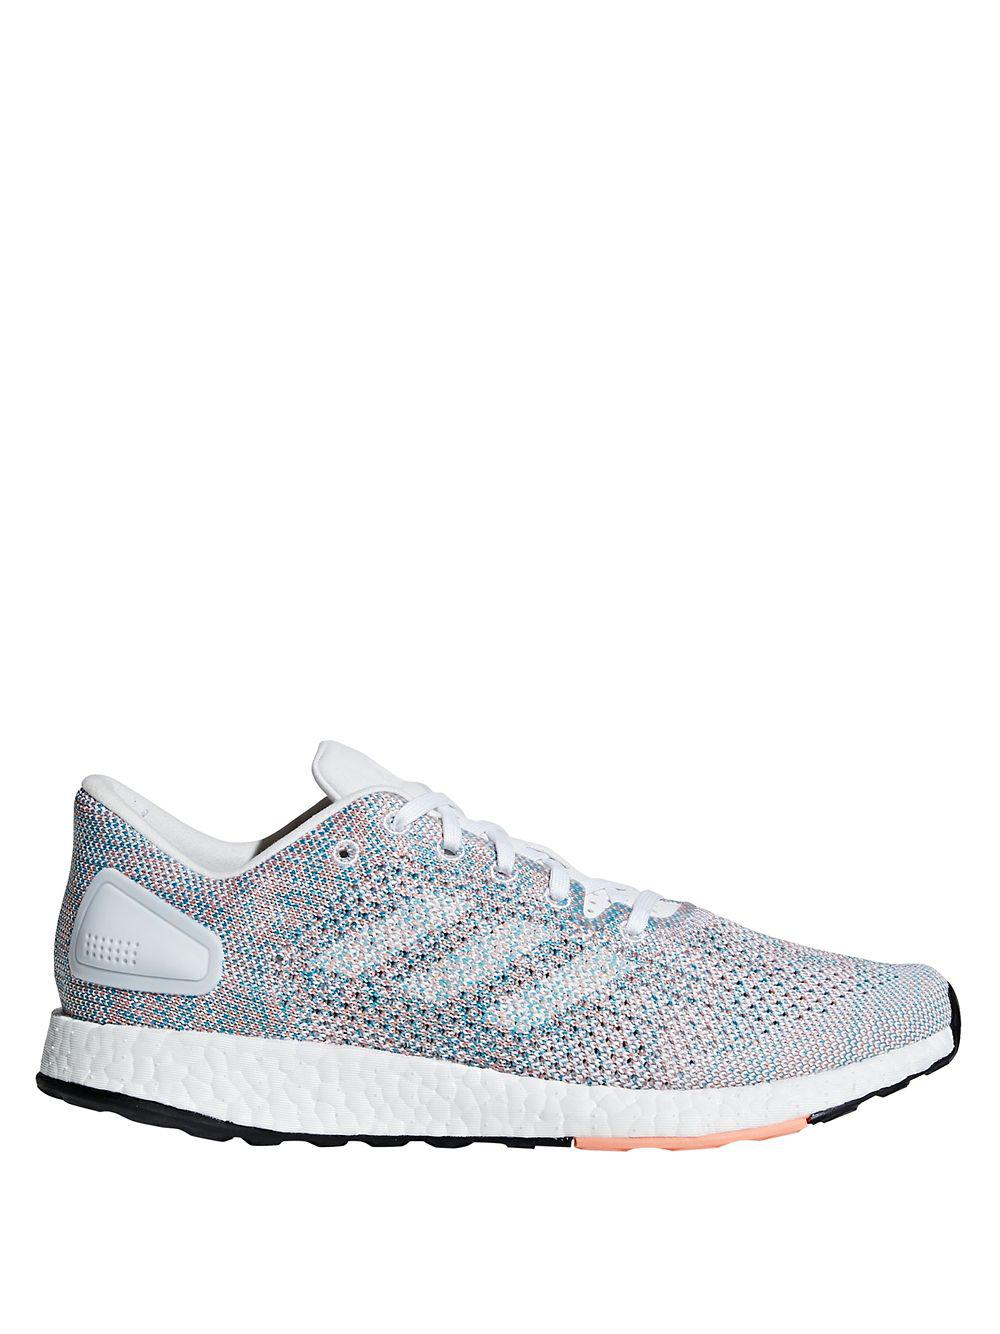 0aca58057 Lyst - Adidas Pureboost Dpr Shoes in White